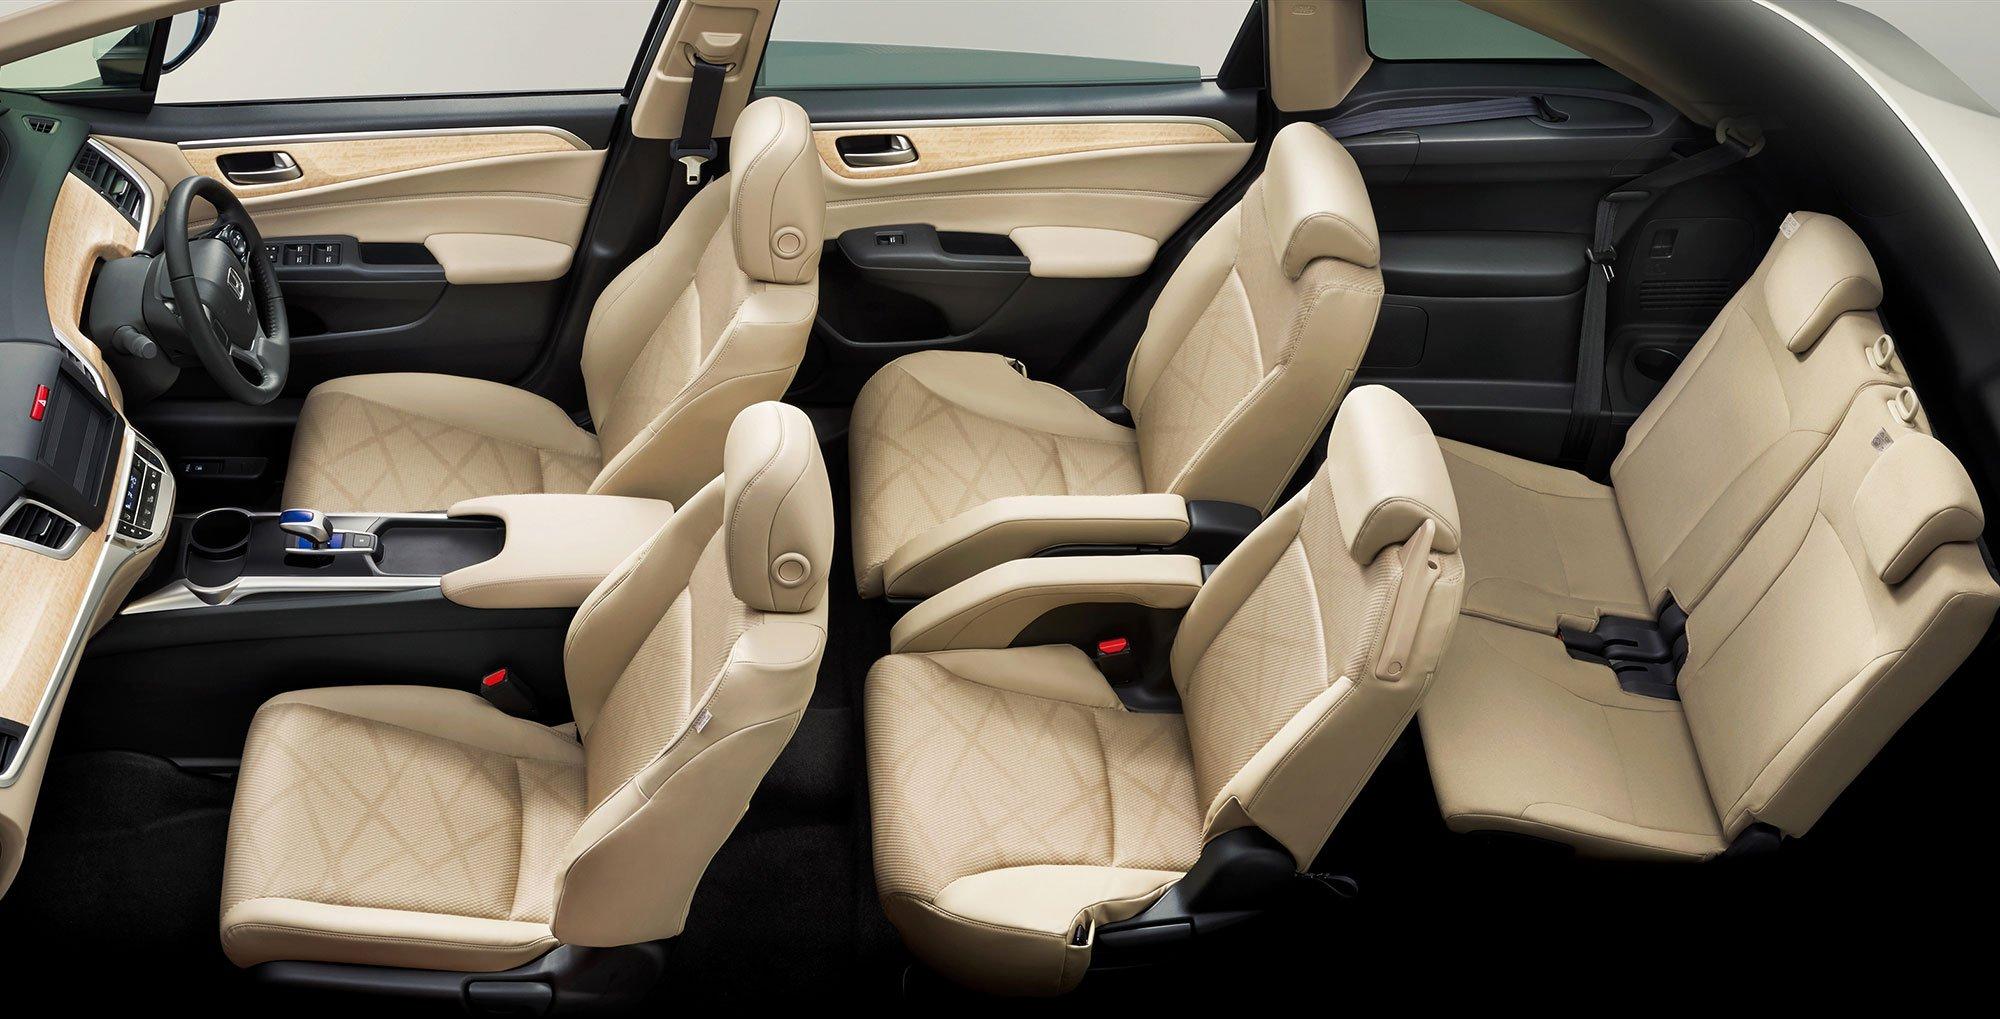 Honda Jade Hybrid 6 Seater Mpv Launching In An Image 301231